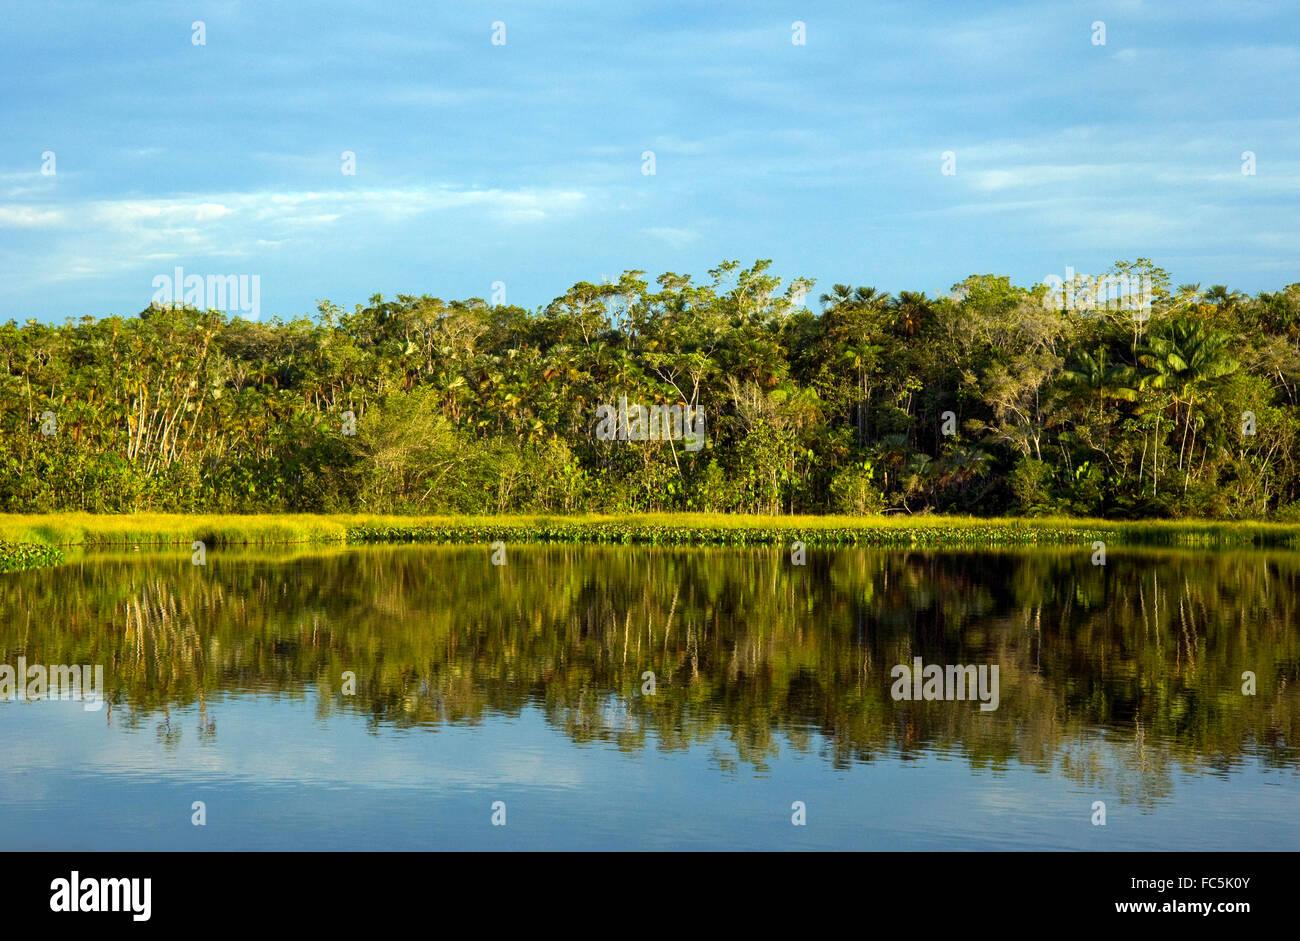 Reflexionen auf dem Amazonas in Ecuador Stockbild